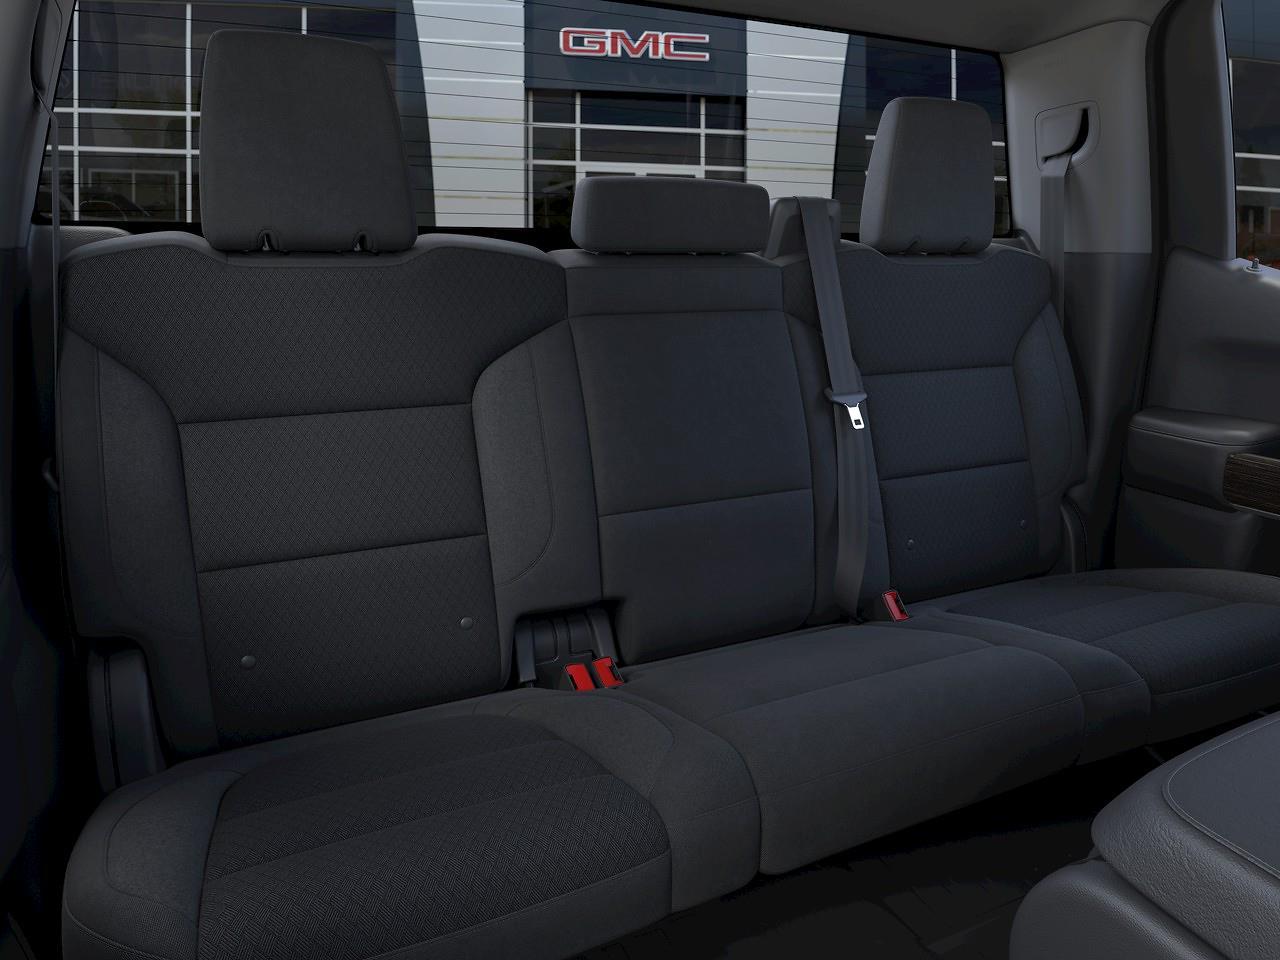 2021 Sierra 1500 Double Cab 4x4,  Pickup #T3510 - photo 14